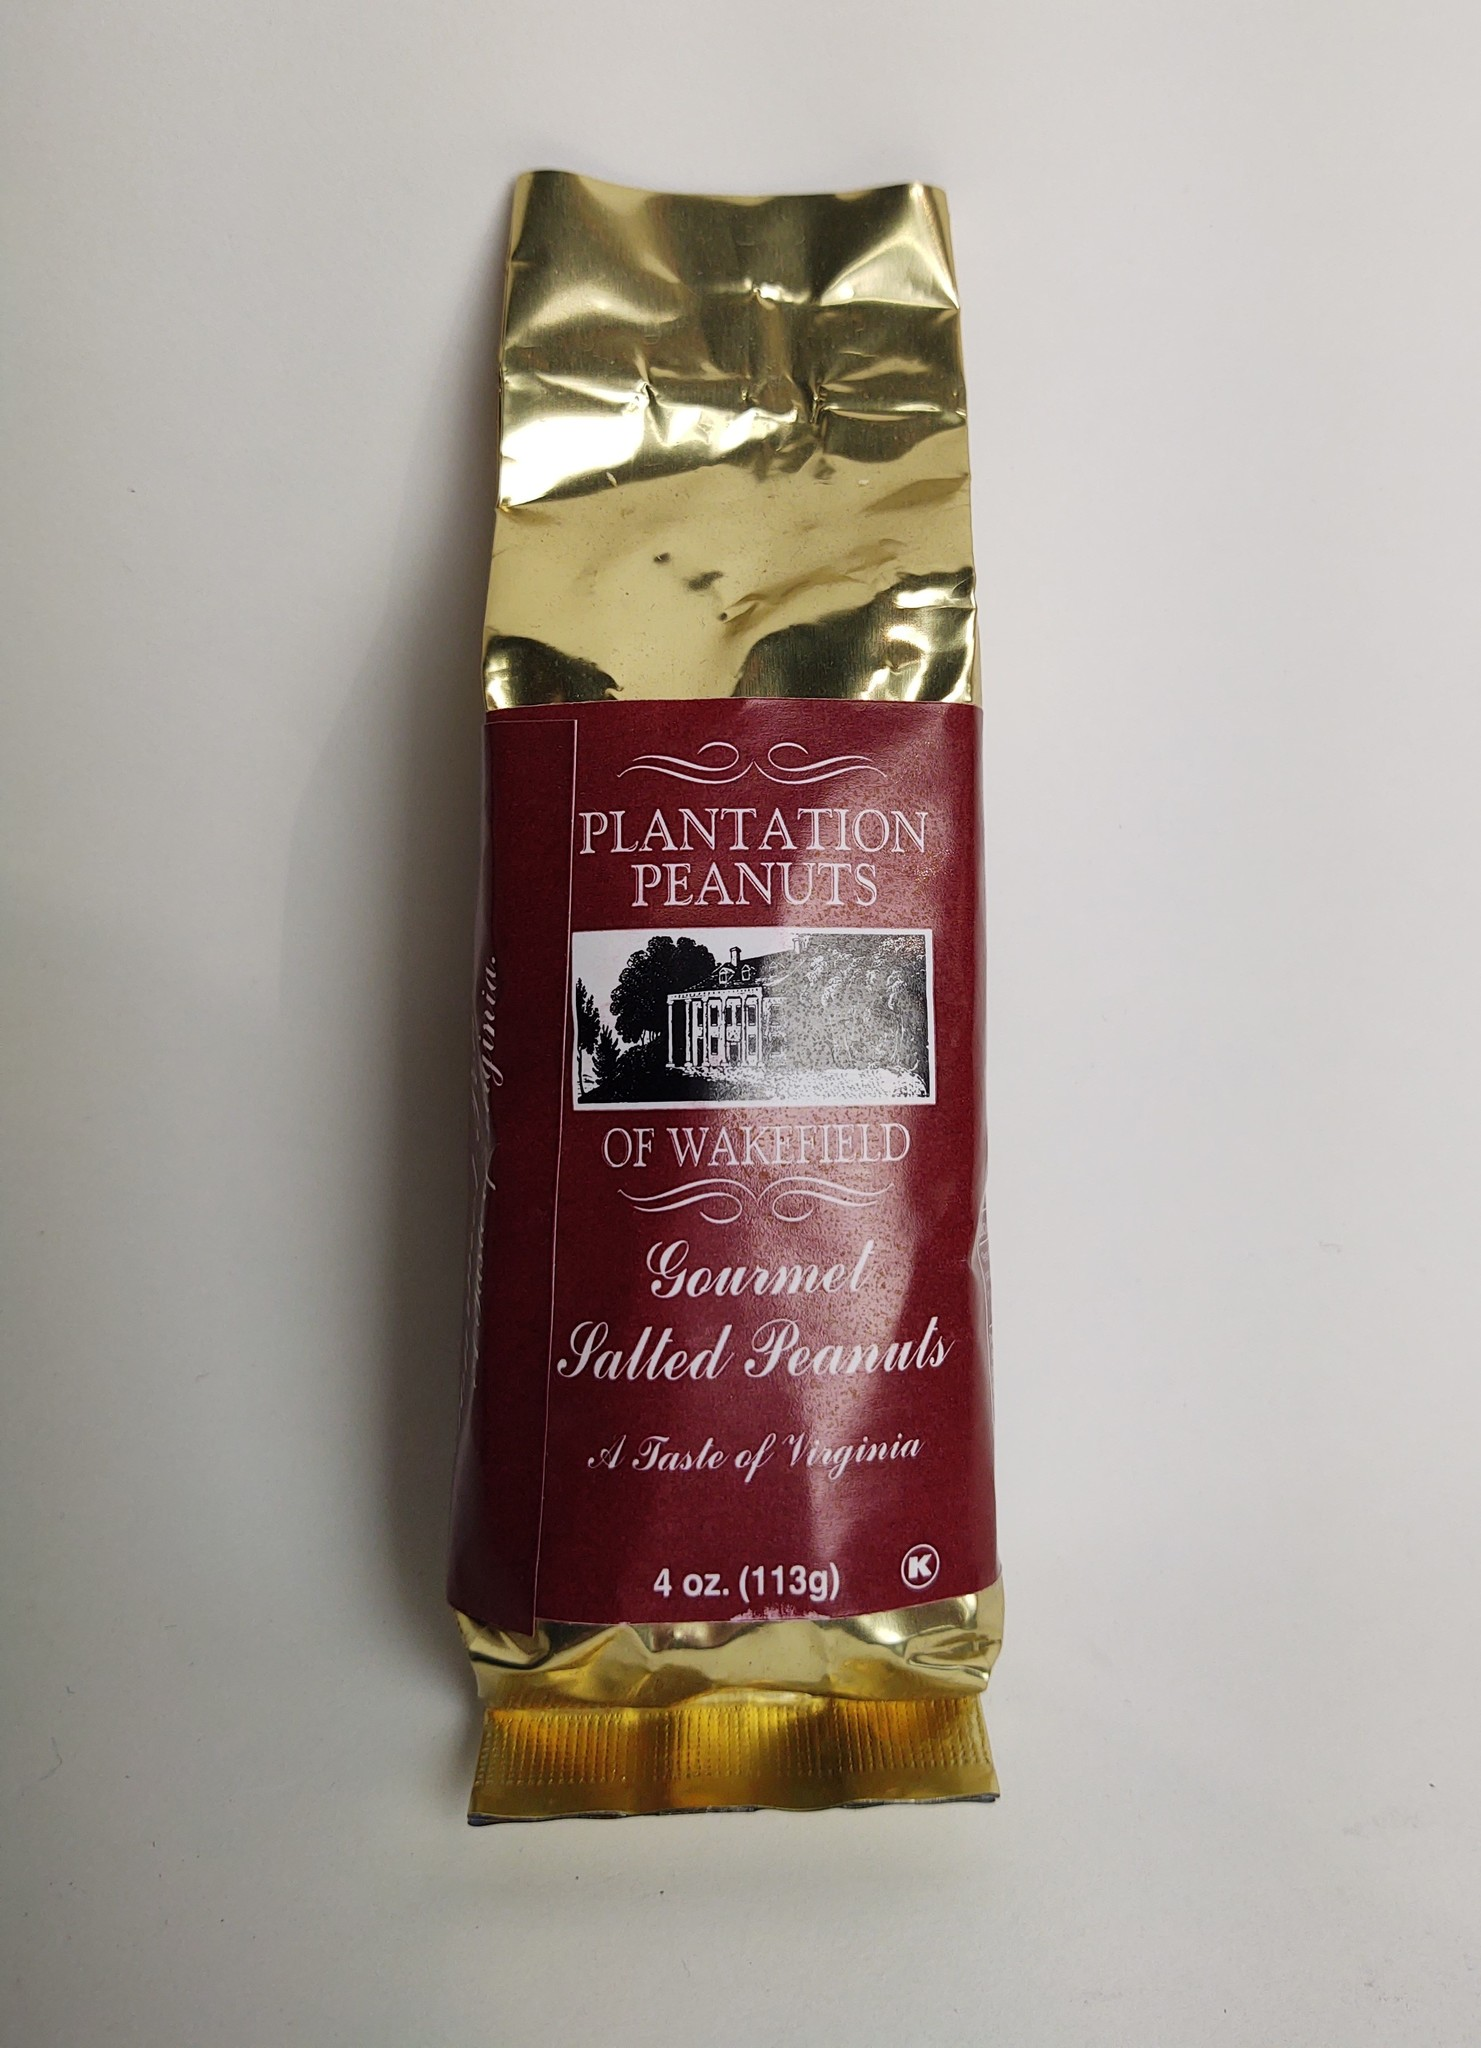 Plantation Peanuts of Wakefield Plantation Peanuts 4 oz. Gourmet Salted Peanuts